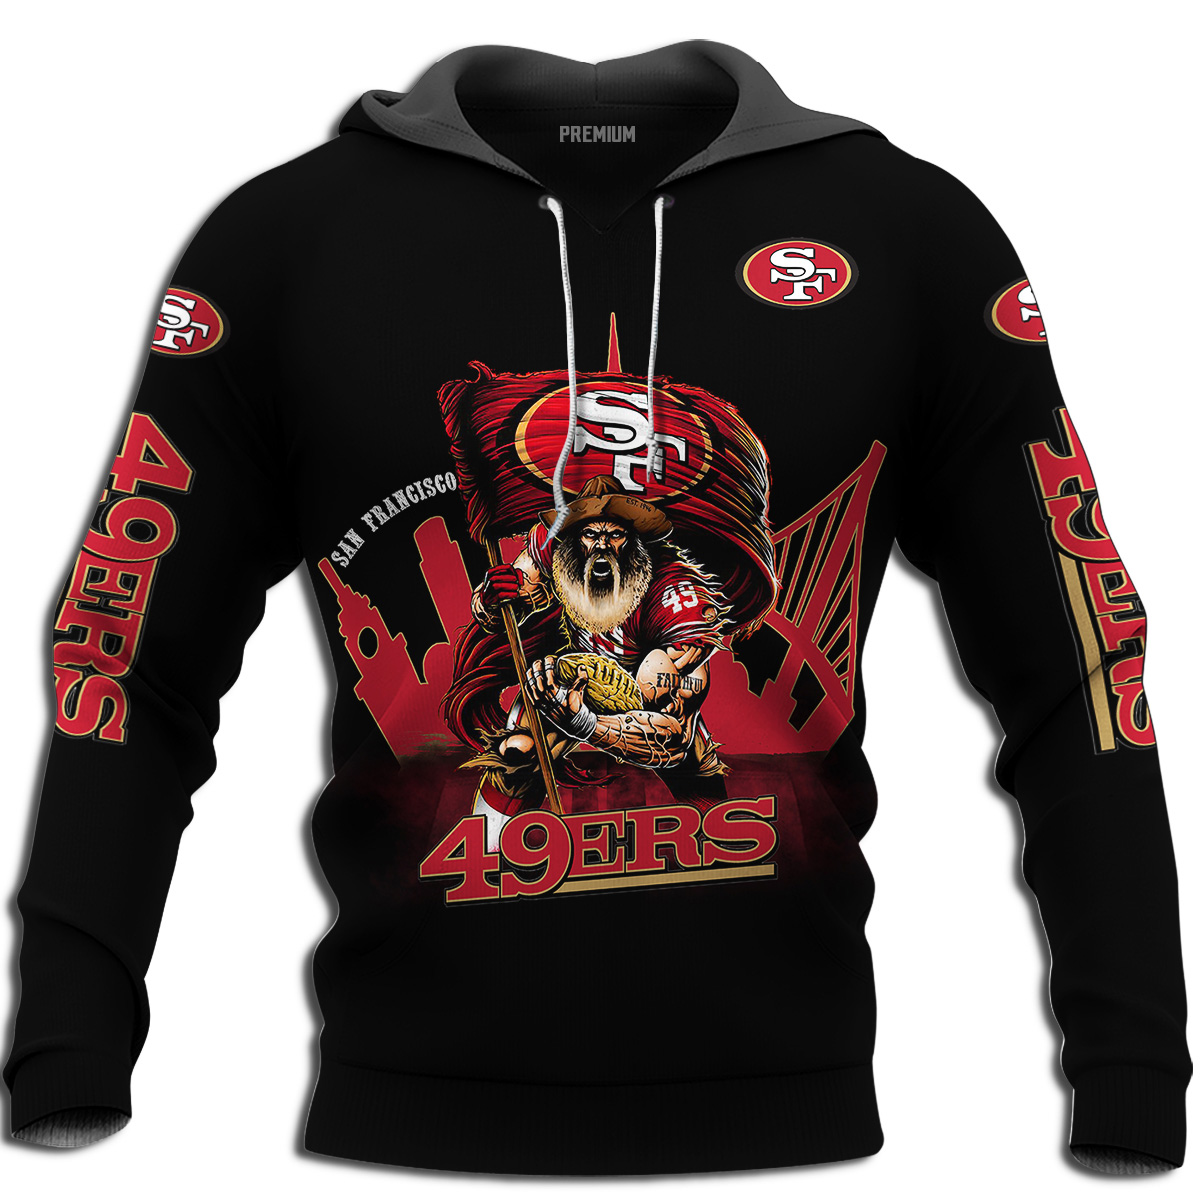 Mens Nfl San Francisco 49ers Super Bowl Liv Champions Hoodie Plus Size Up To 5xl